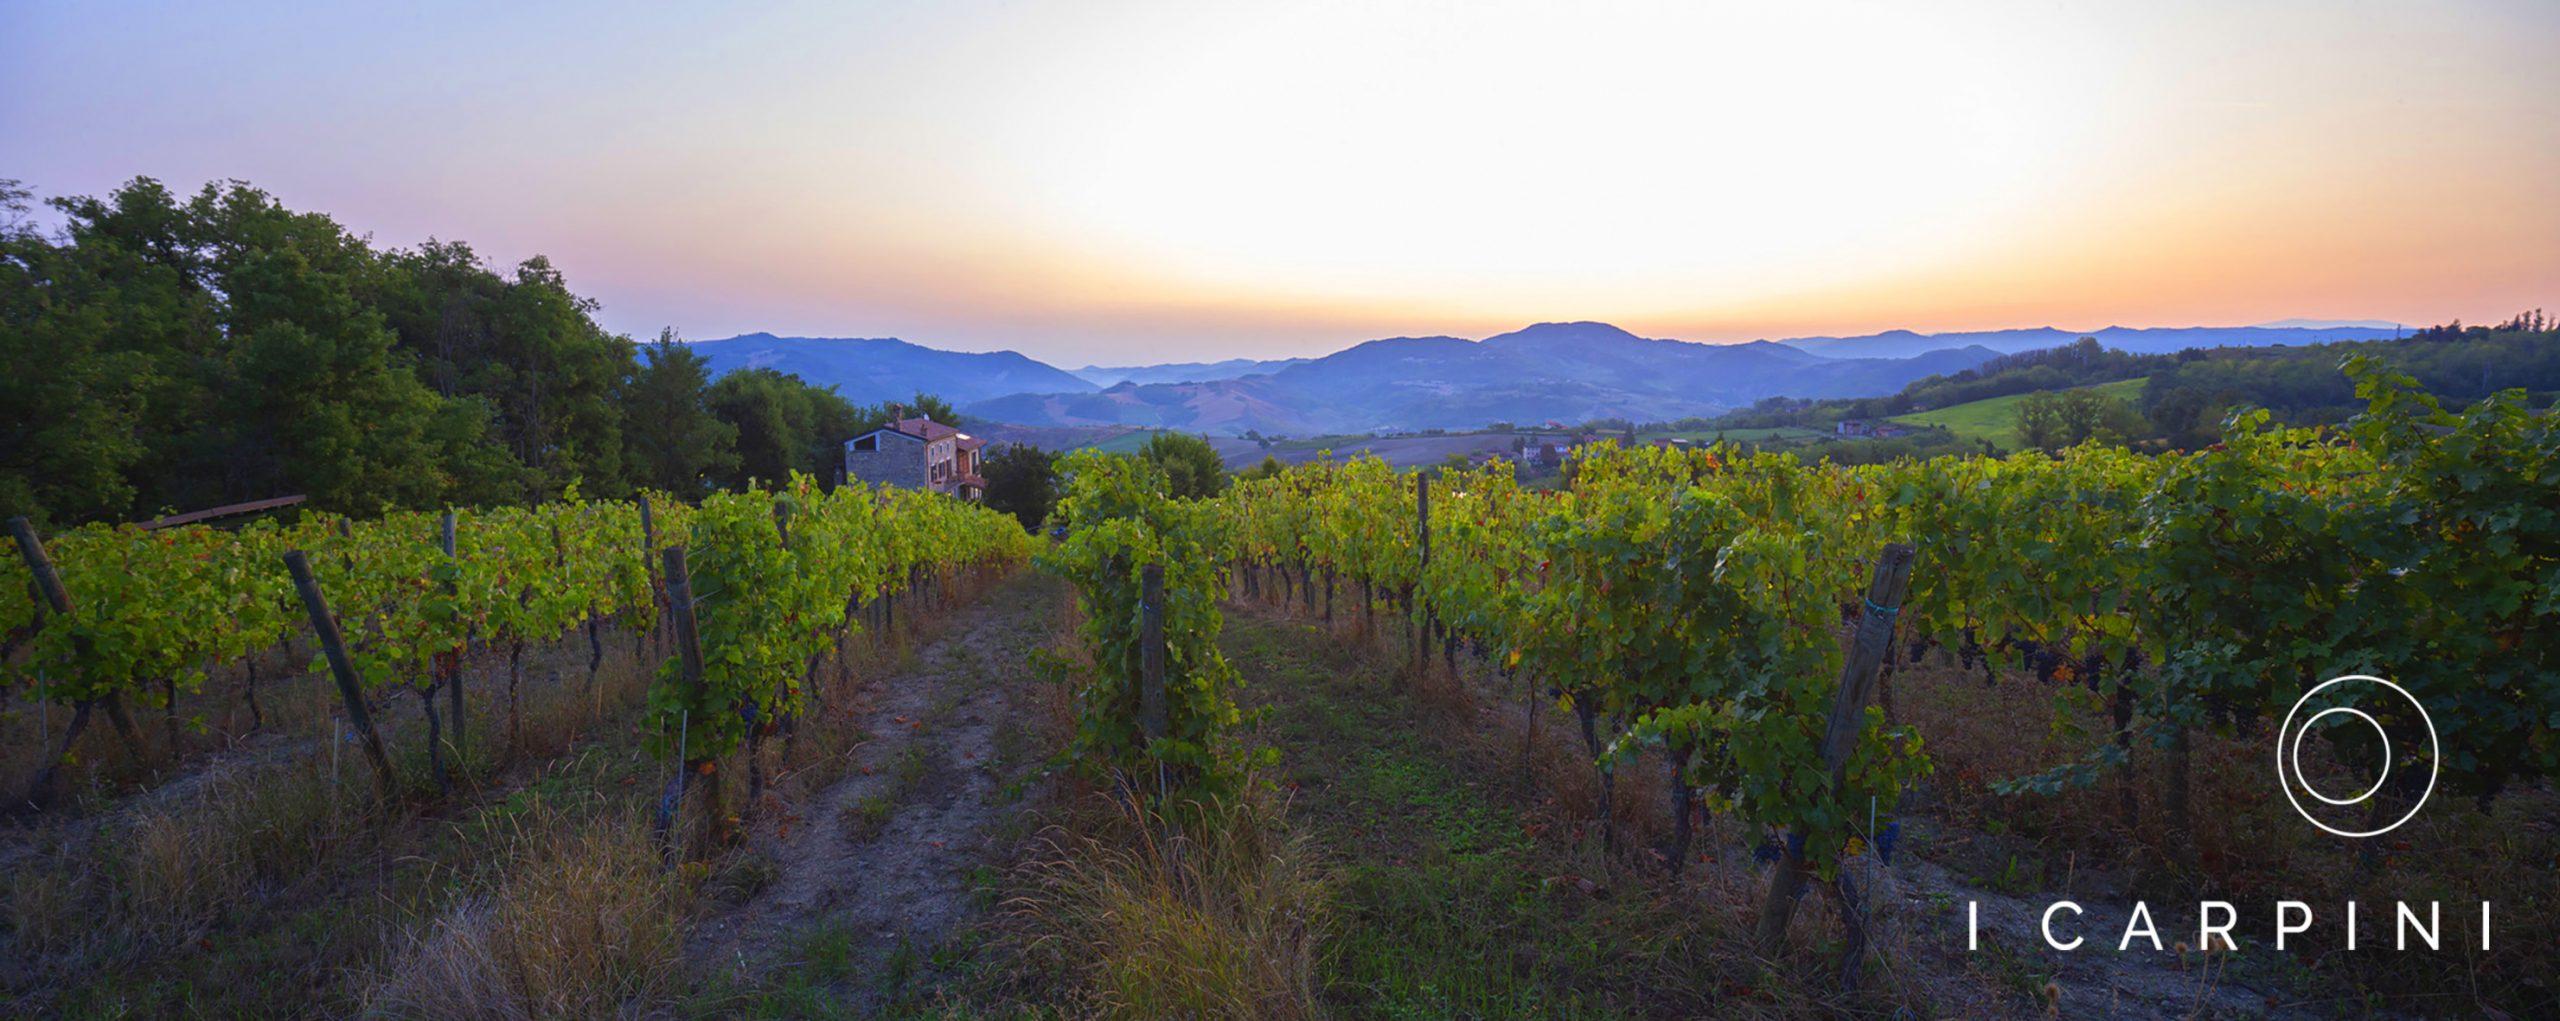 Cascina I Carpini_vineyard